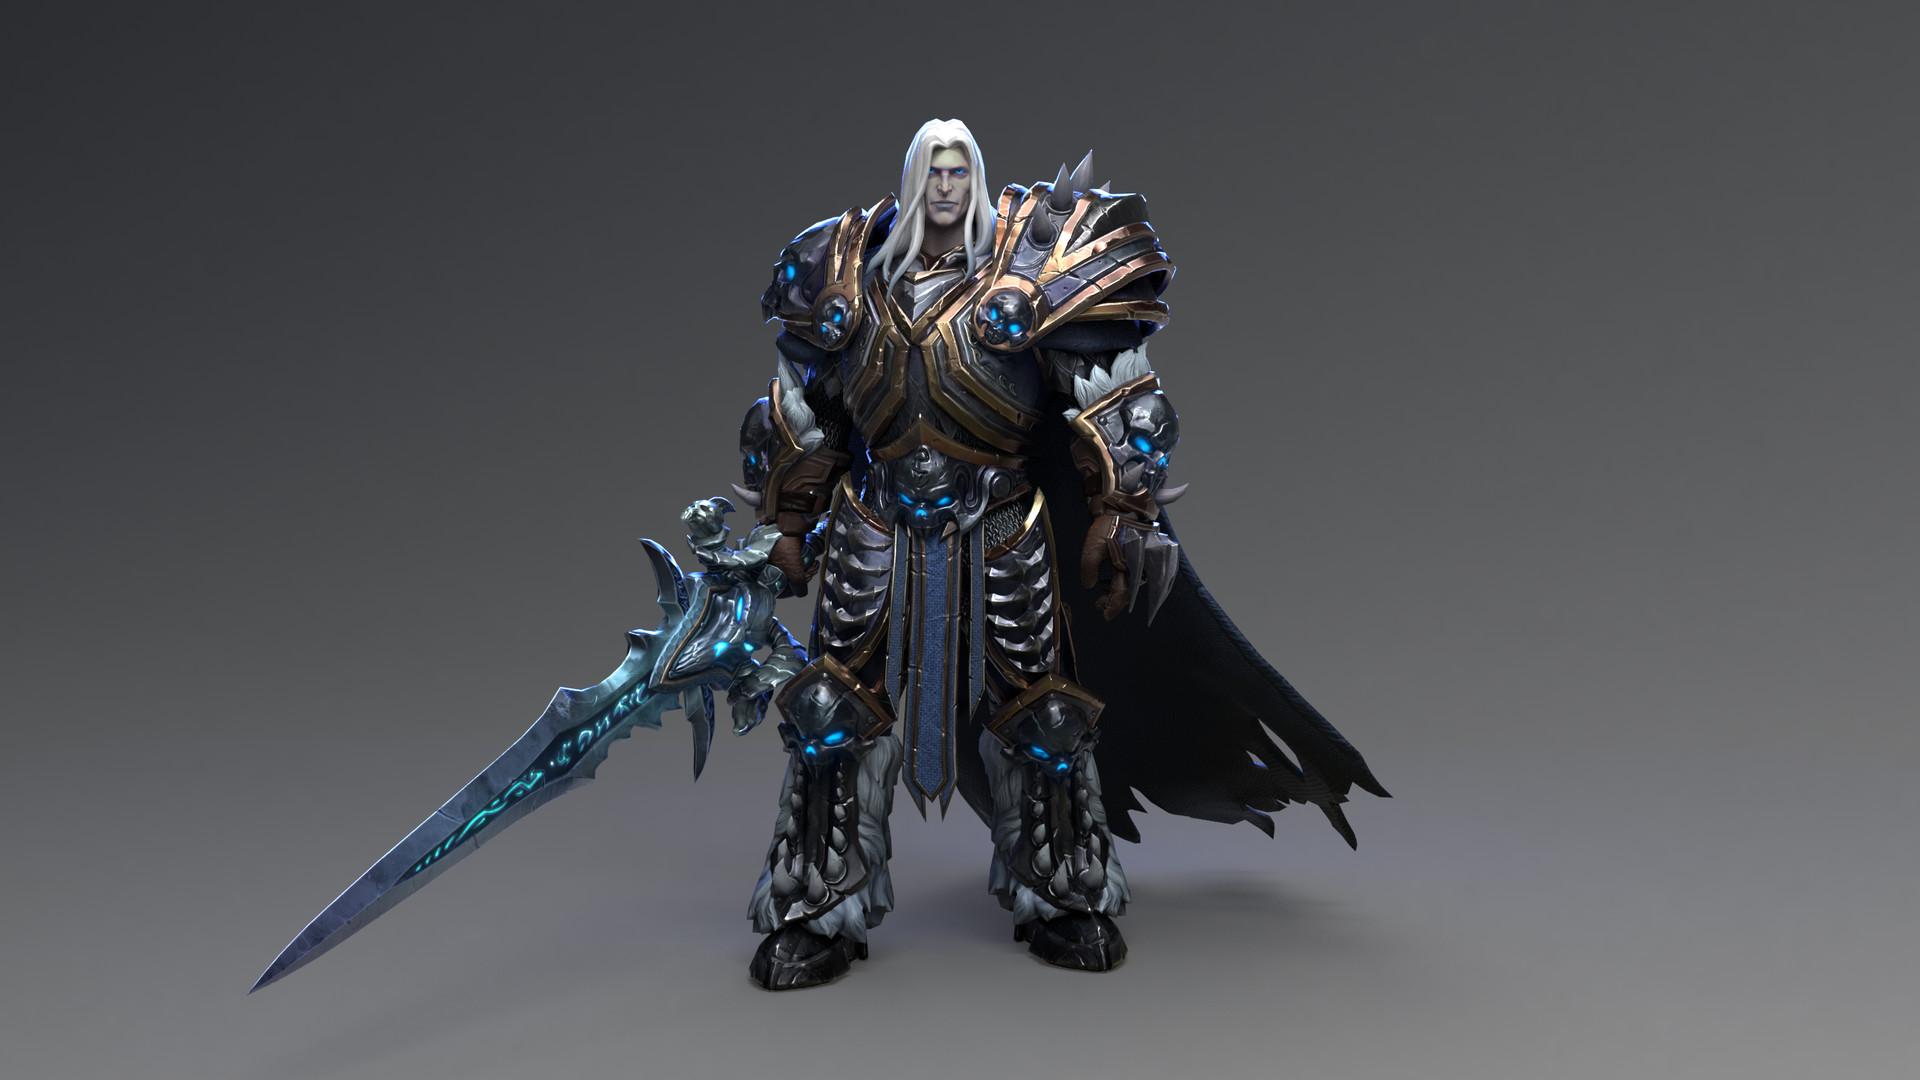 ArtStation - Arthas, the Lich King - BLIZZARD inspired character ...